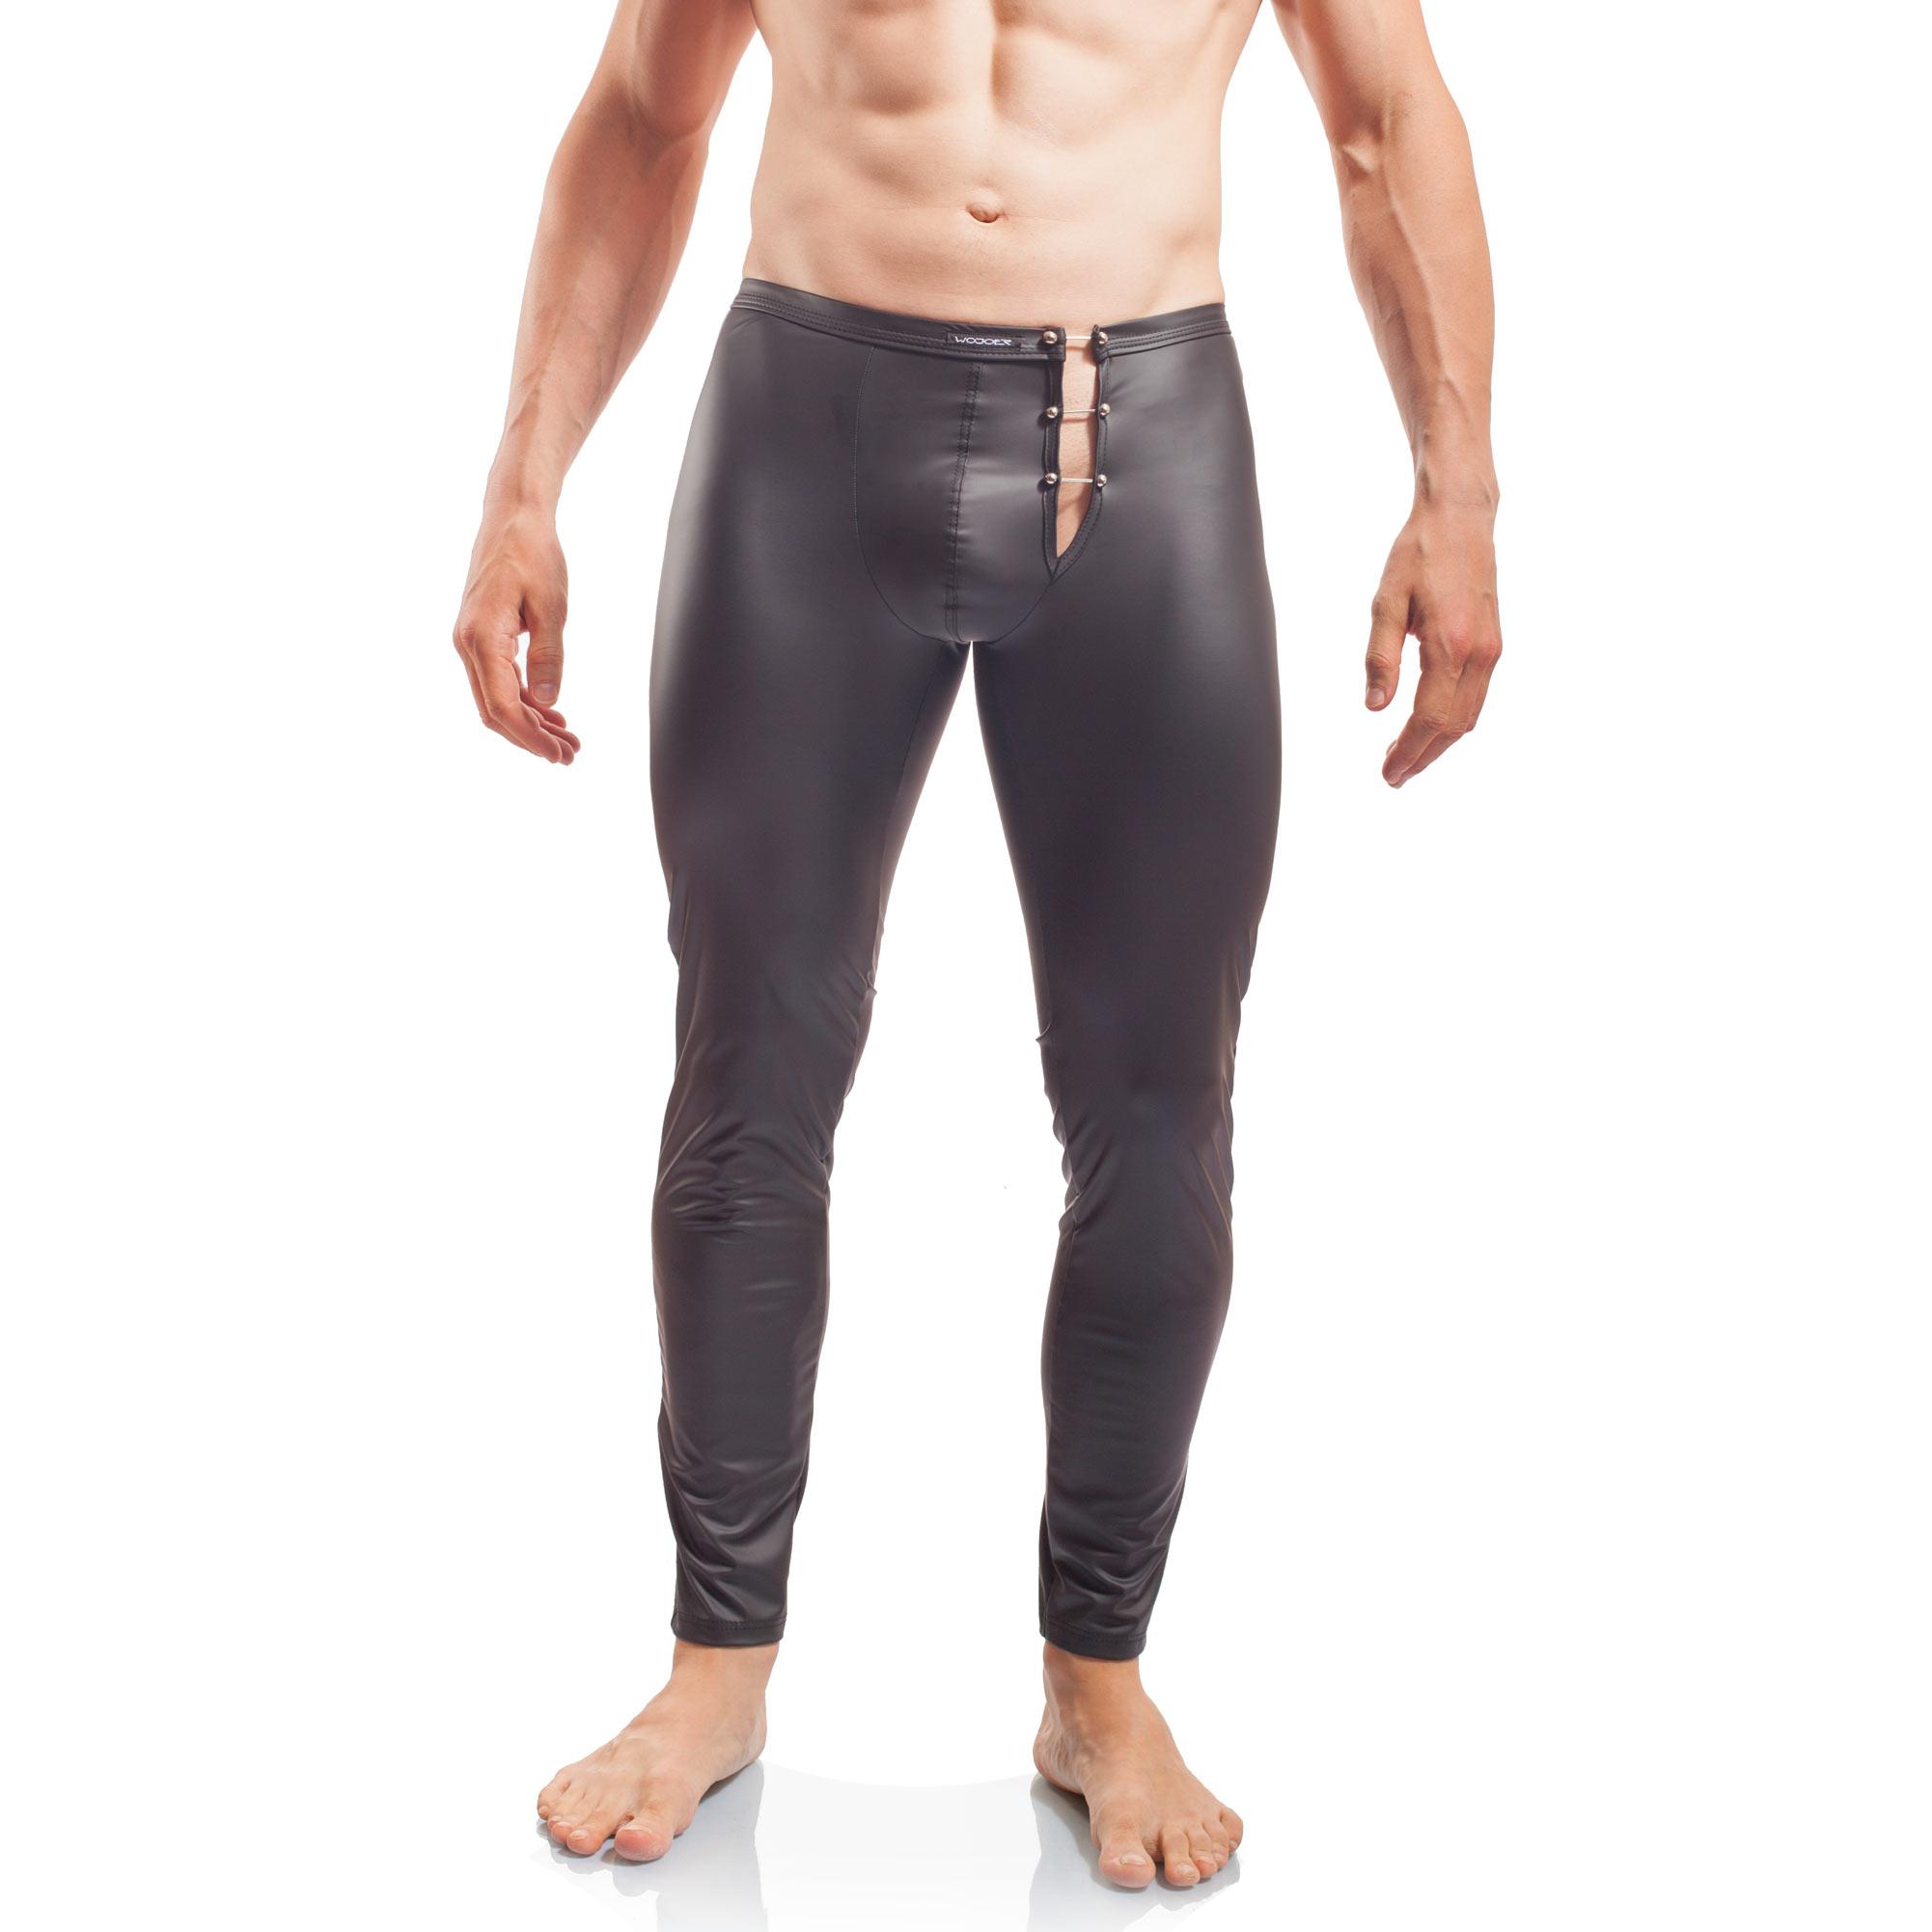 Piercing Leggings, mattes Leder, Synlex, schwarz, Leatherlike, eng anliegende Leggings